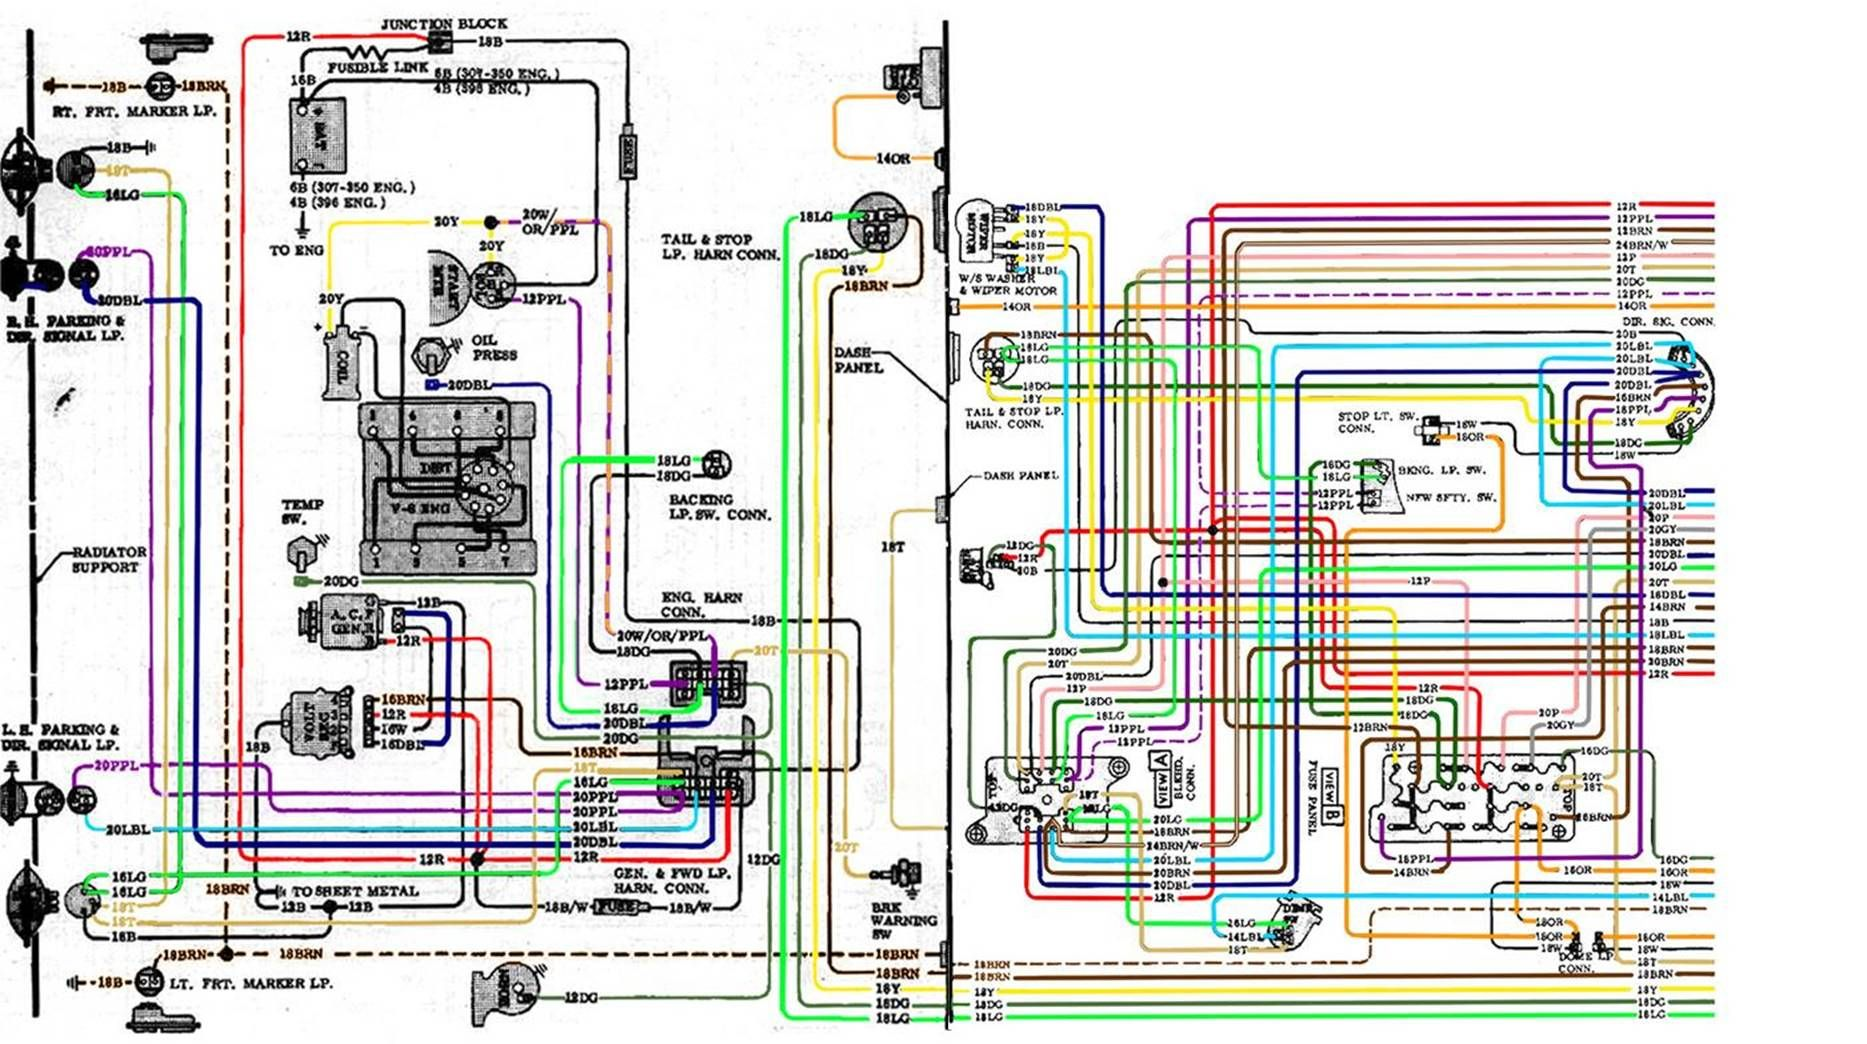 medium resolution of vega wiring diagram lights everything wiring diagram 1972 chevy nova wiring diagram 72 chevy wiring diagram